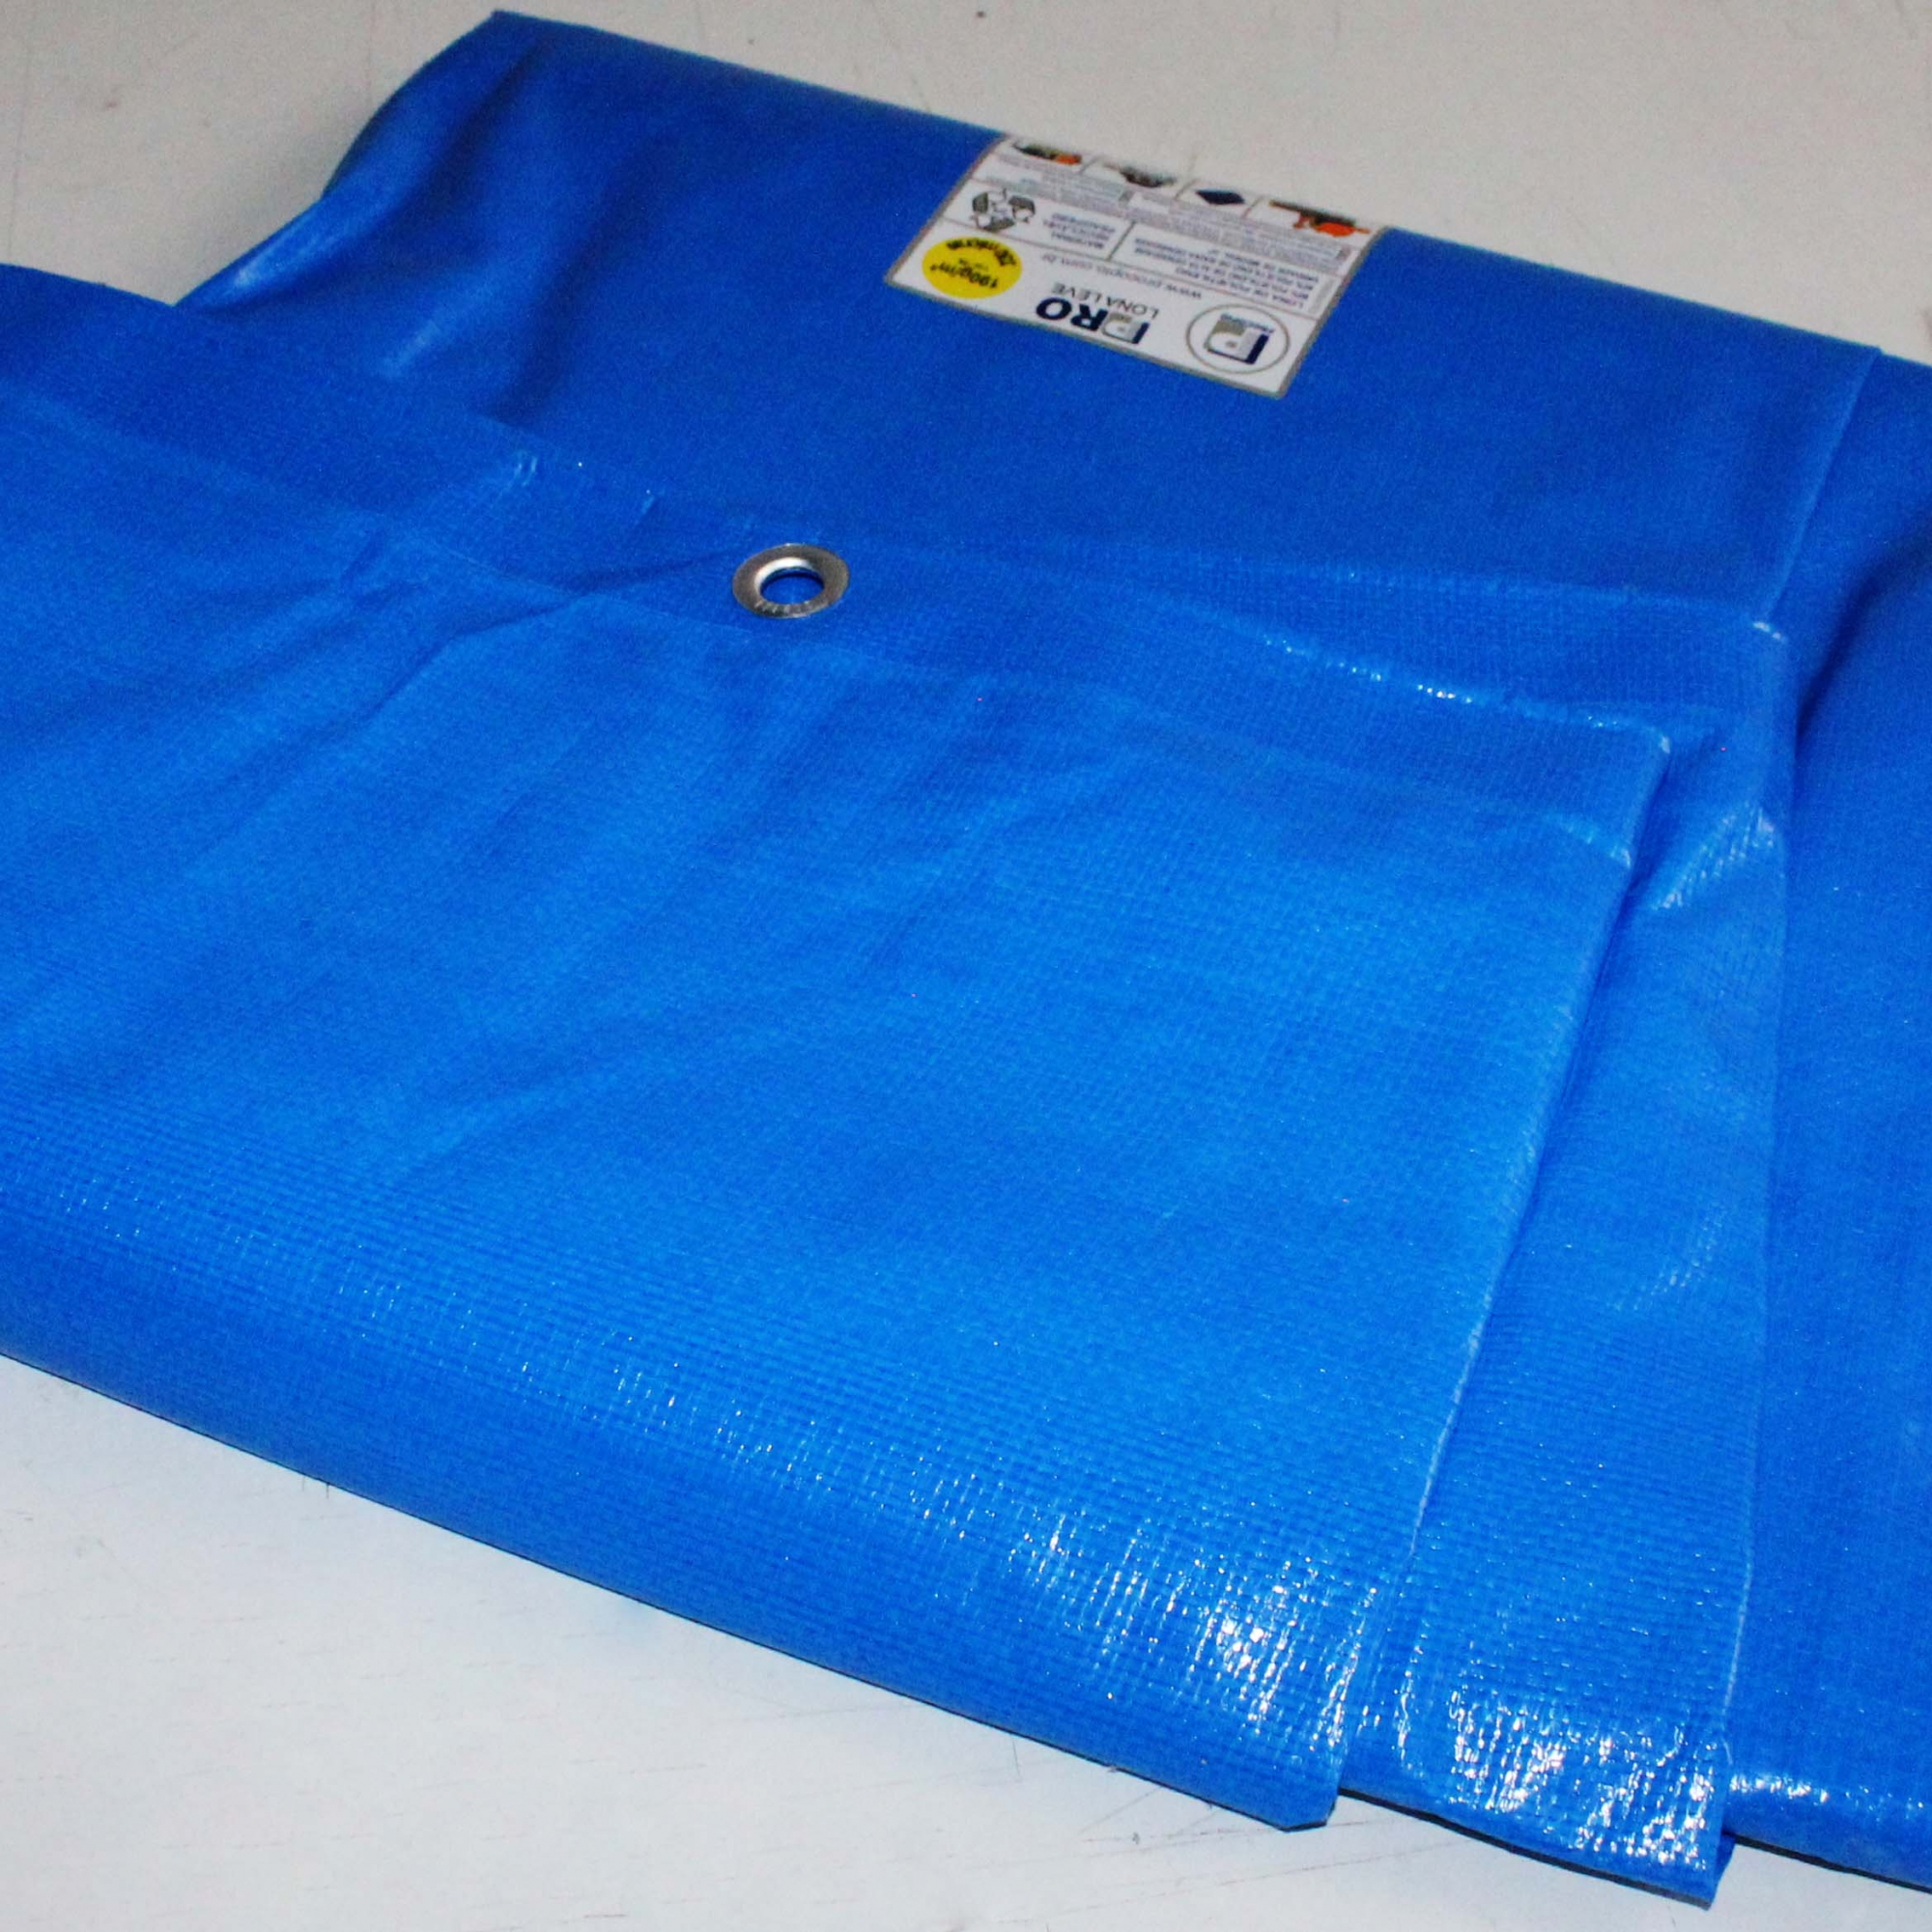 Prolona leve agric azul 3x4m